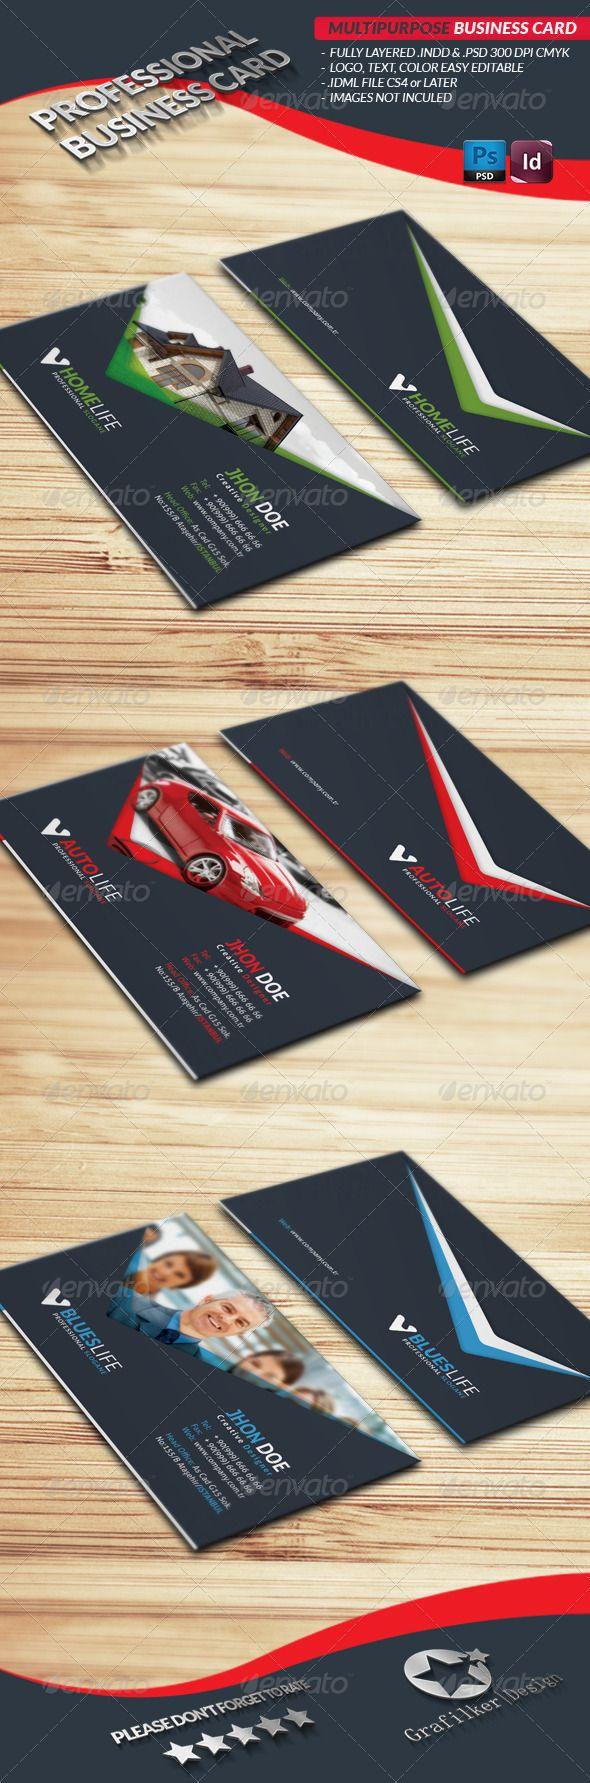 Multipurpose Business Card Business Card Inspiration Medical Business Card Business Cards Creative